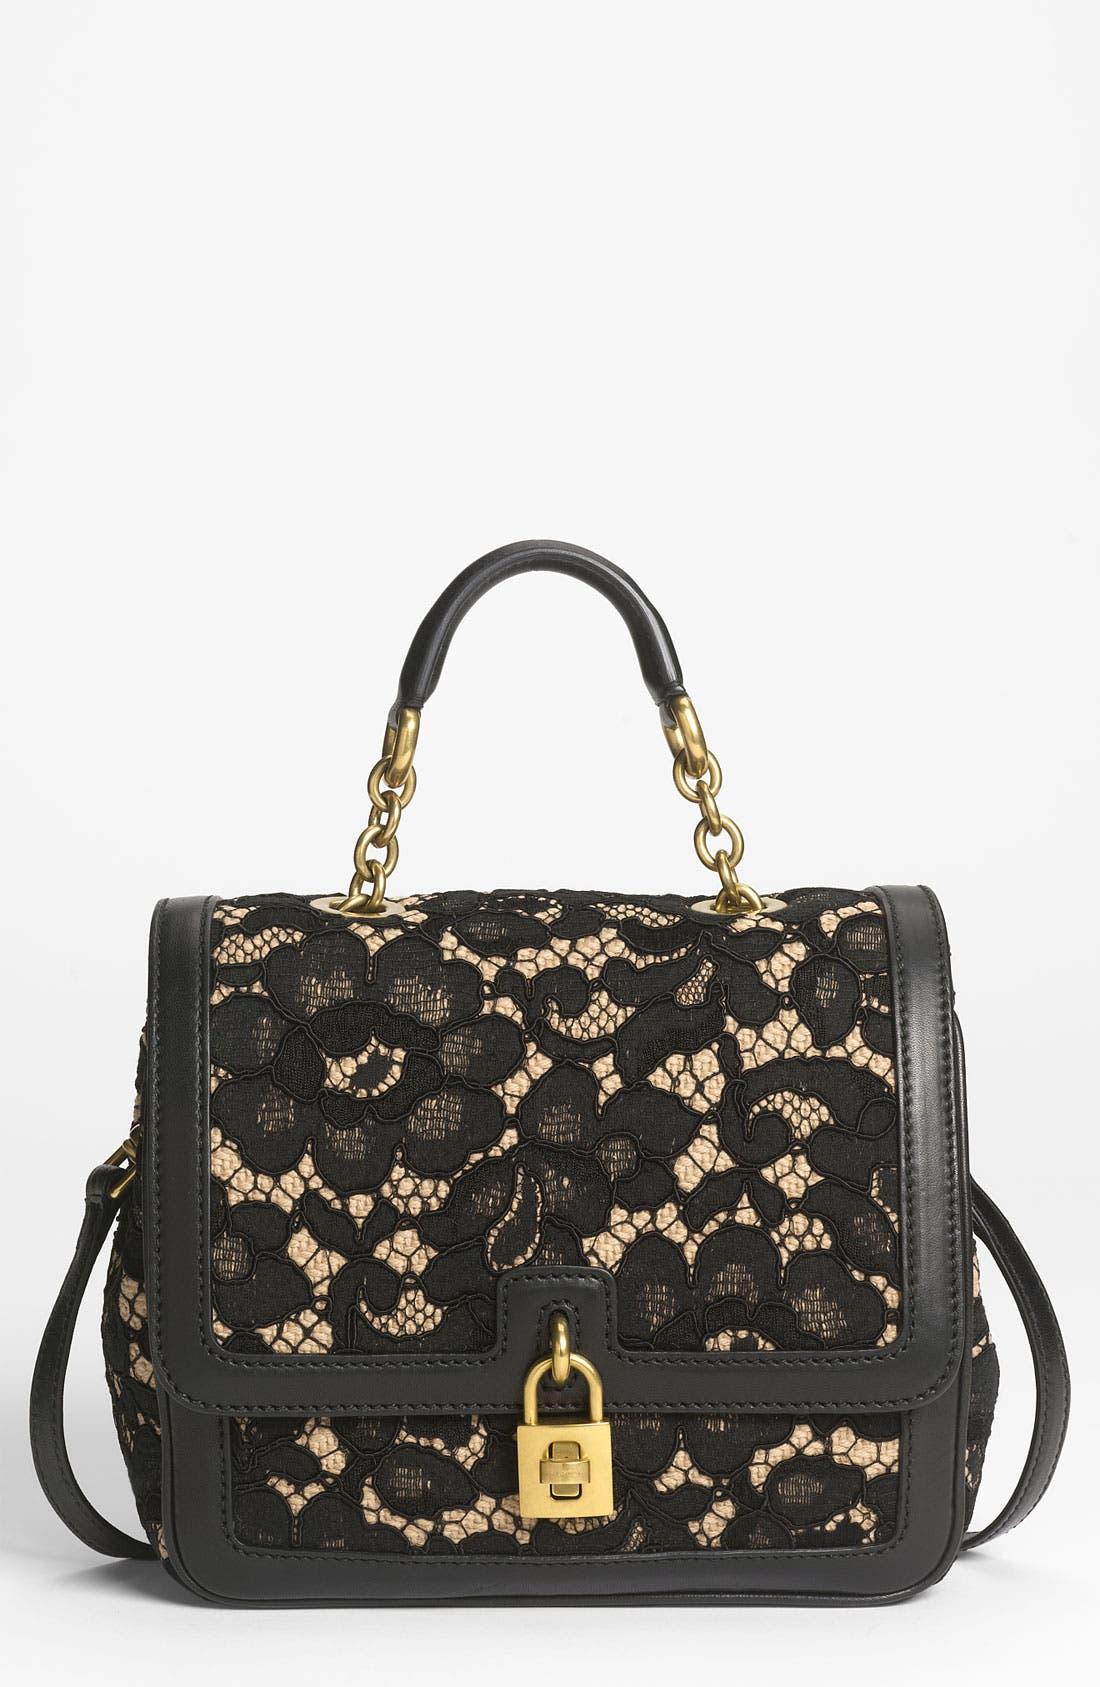 Main Image - Dolce&Gabbana 'Miss Dolce' Satchel